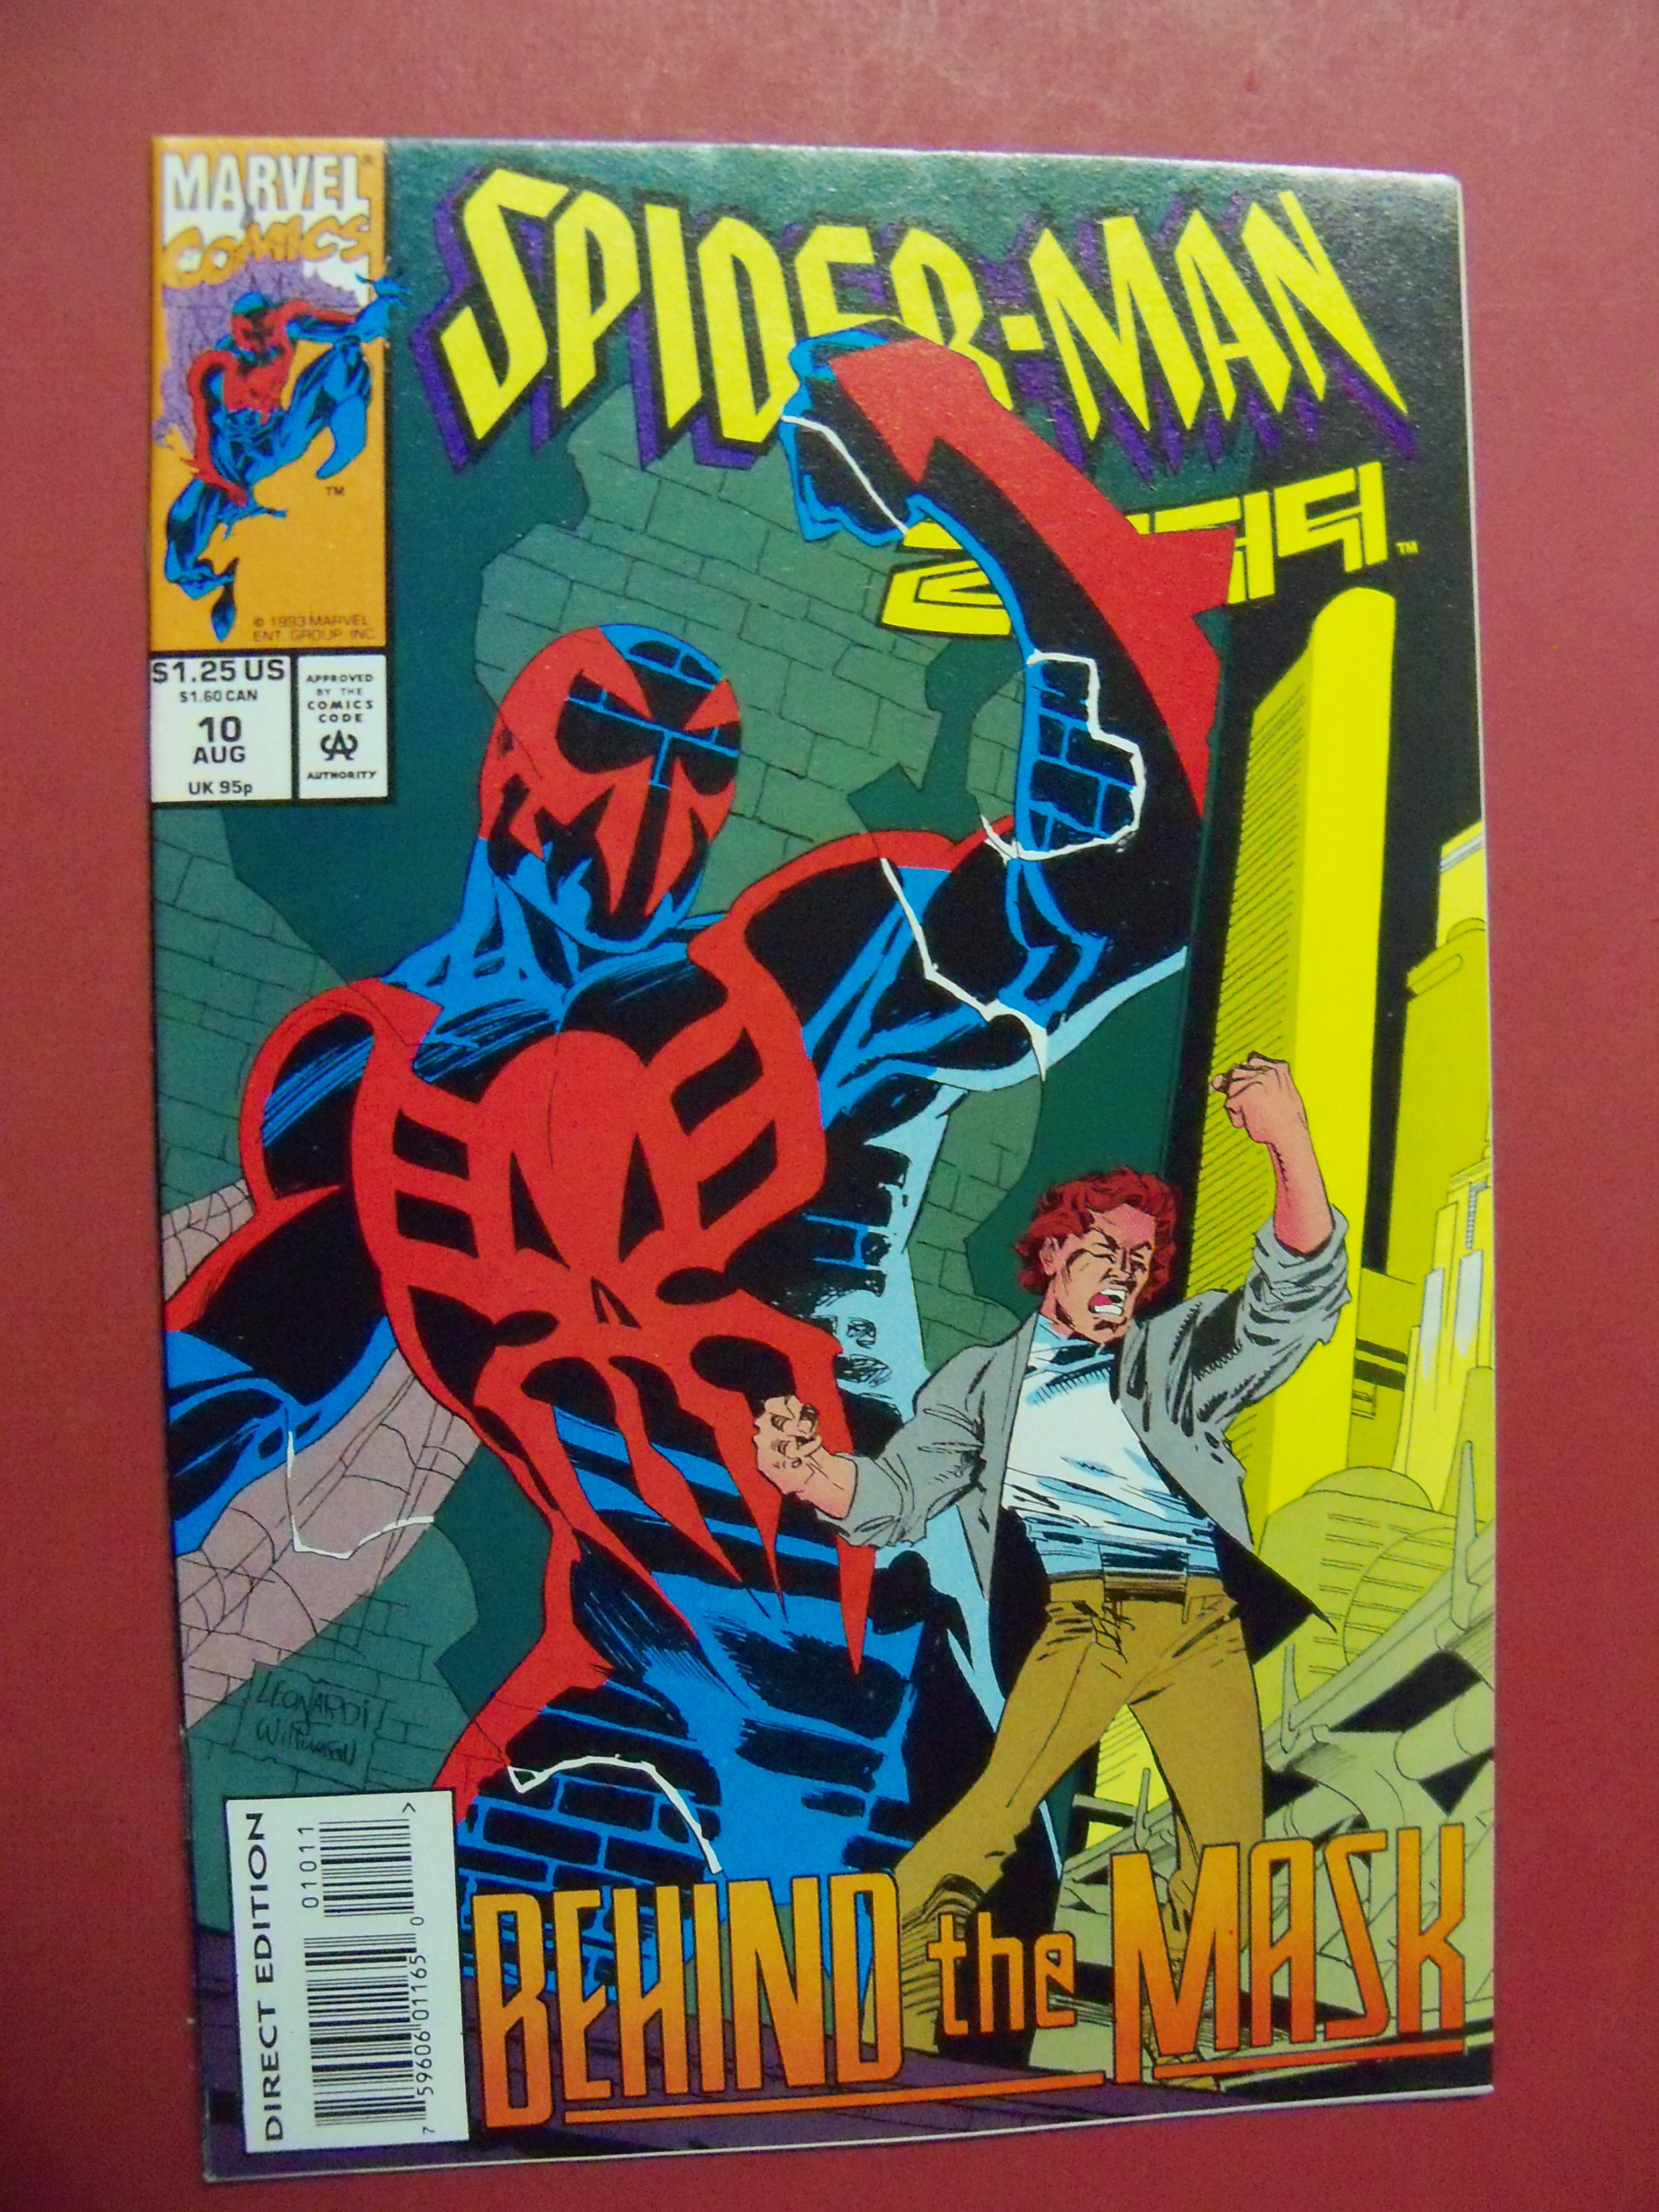 Comic Book NM 2016 MARVEL Comics SPIDER-MAN 2099 #3